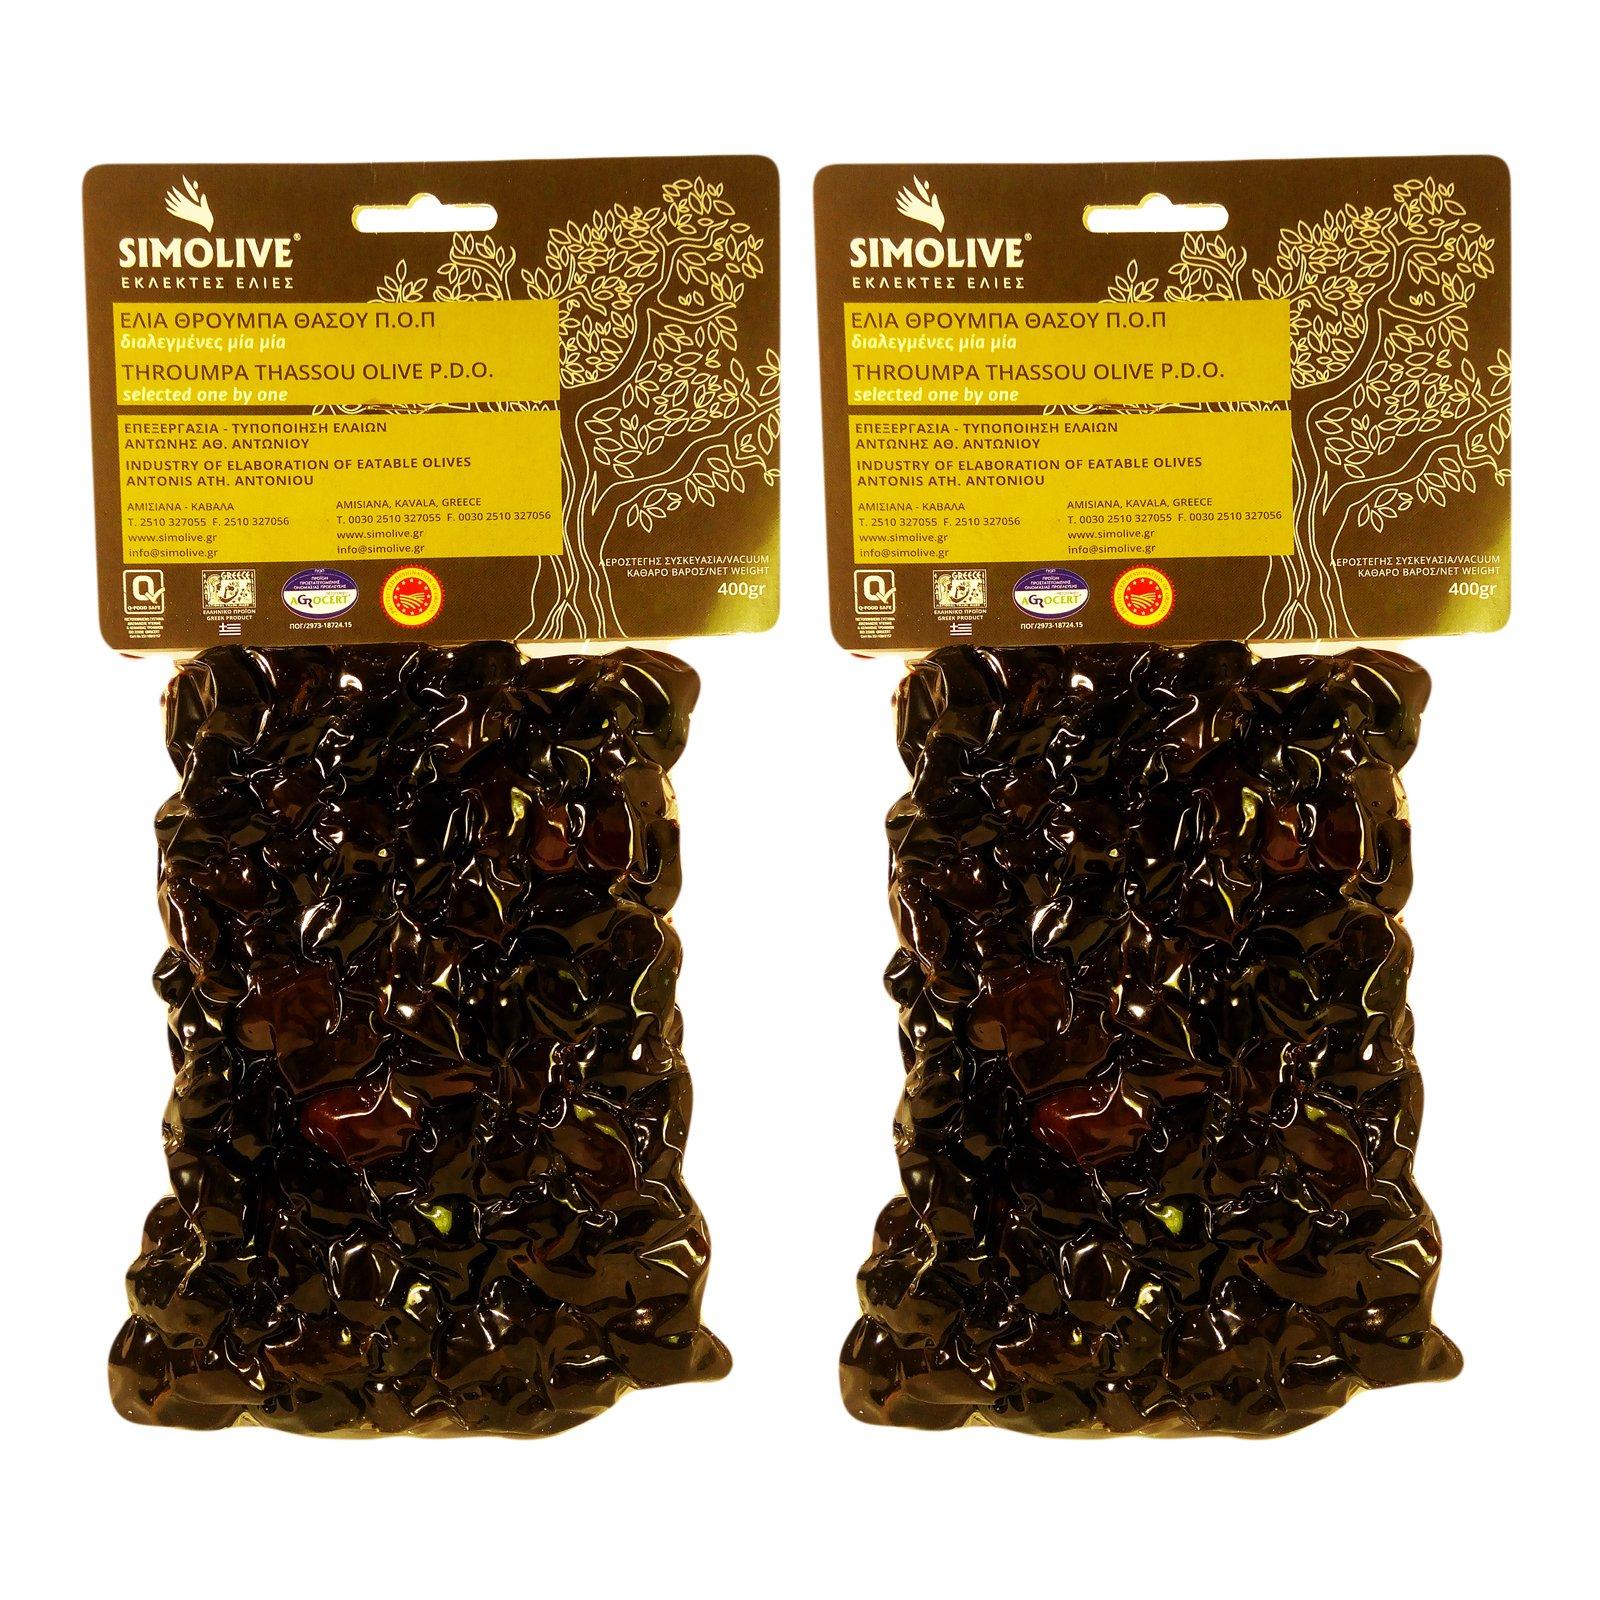 Simolive Greek Throuba Olives from Thassos 800 gr Vacuum-sealed